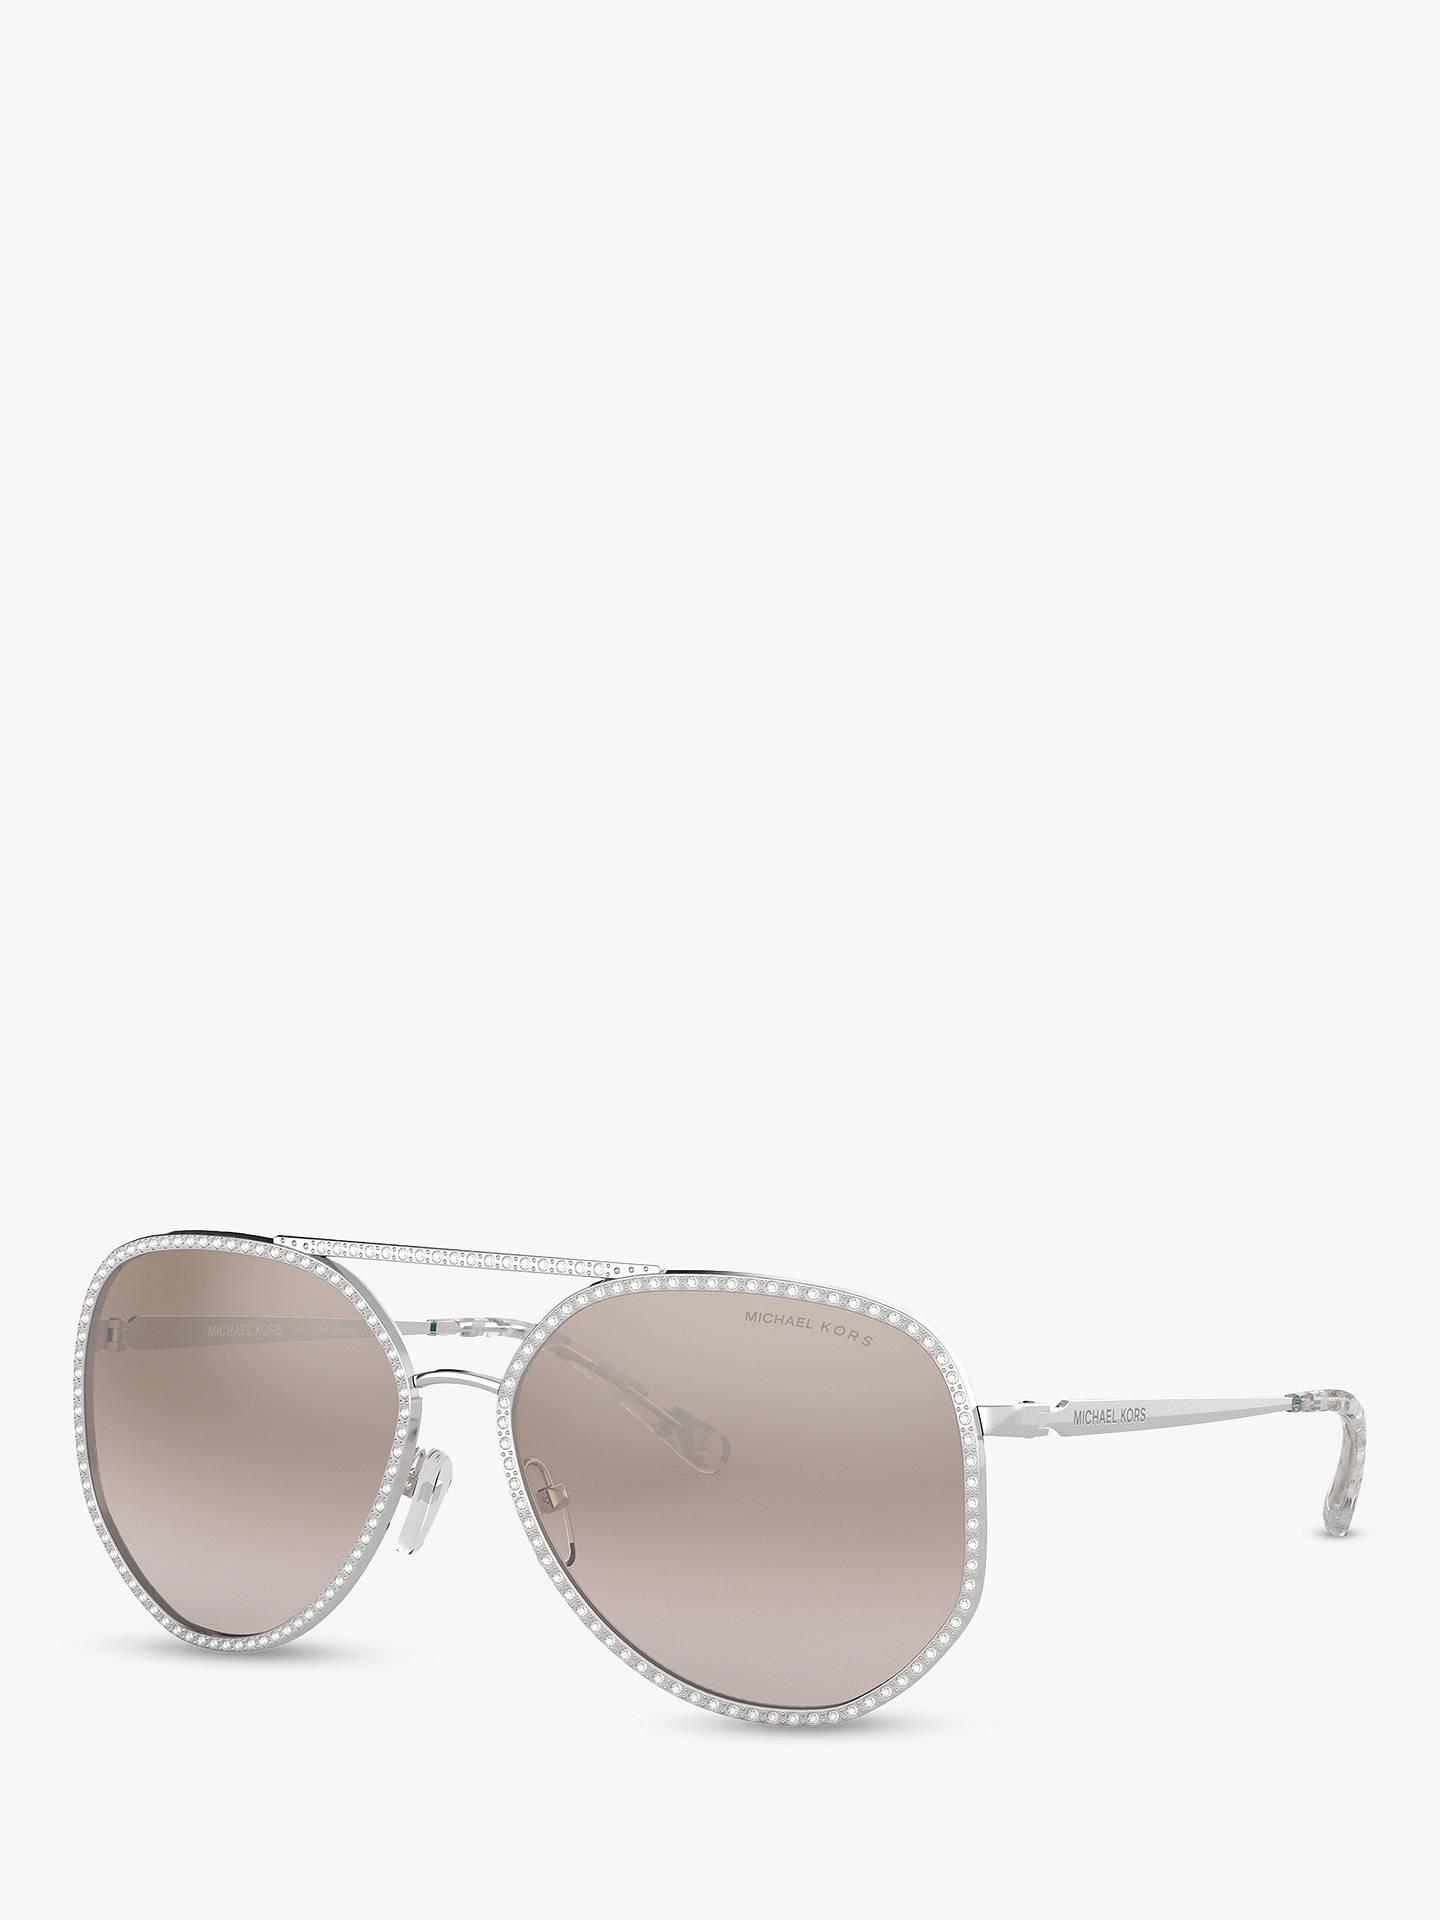 cbd791f3a Buy Michael Kors MK1039B Women's Miami Sunglasses, Silver/Pink Mirror  Online at johnlewis.